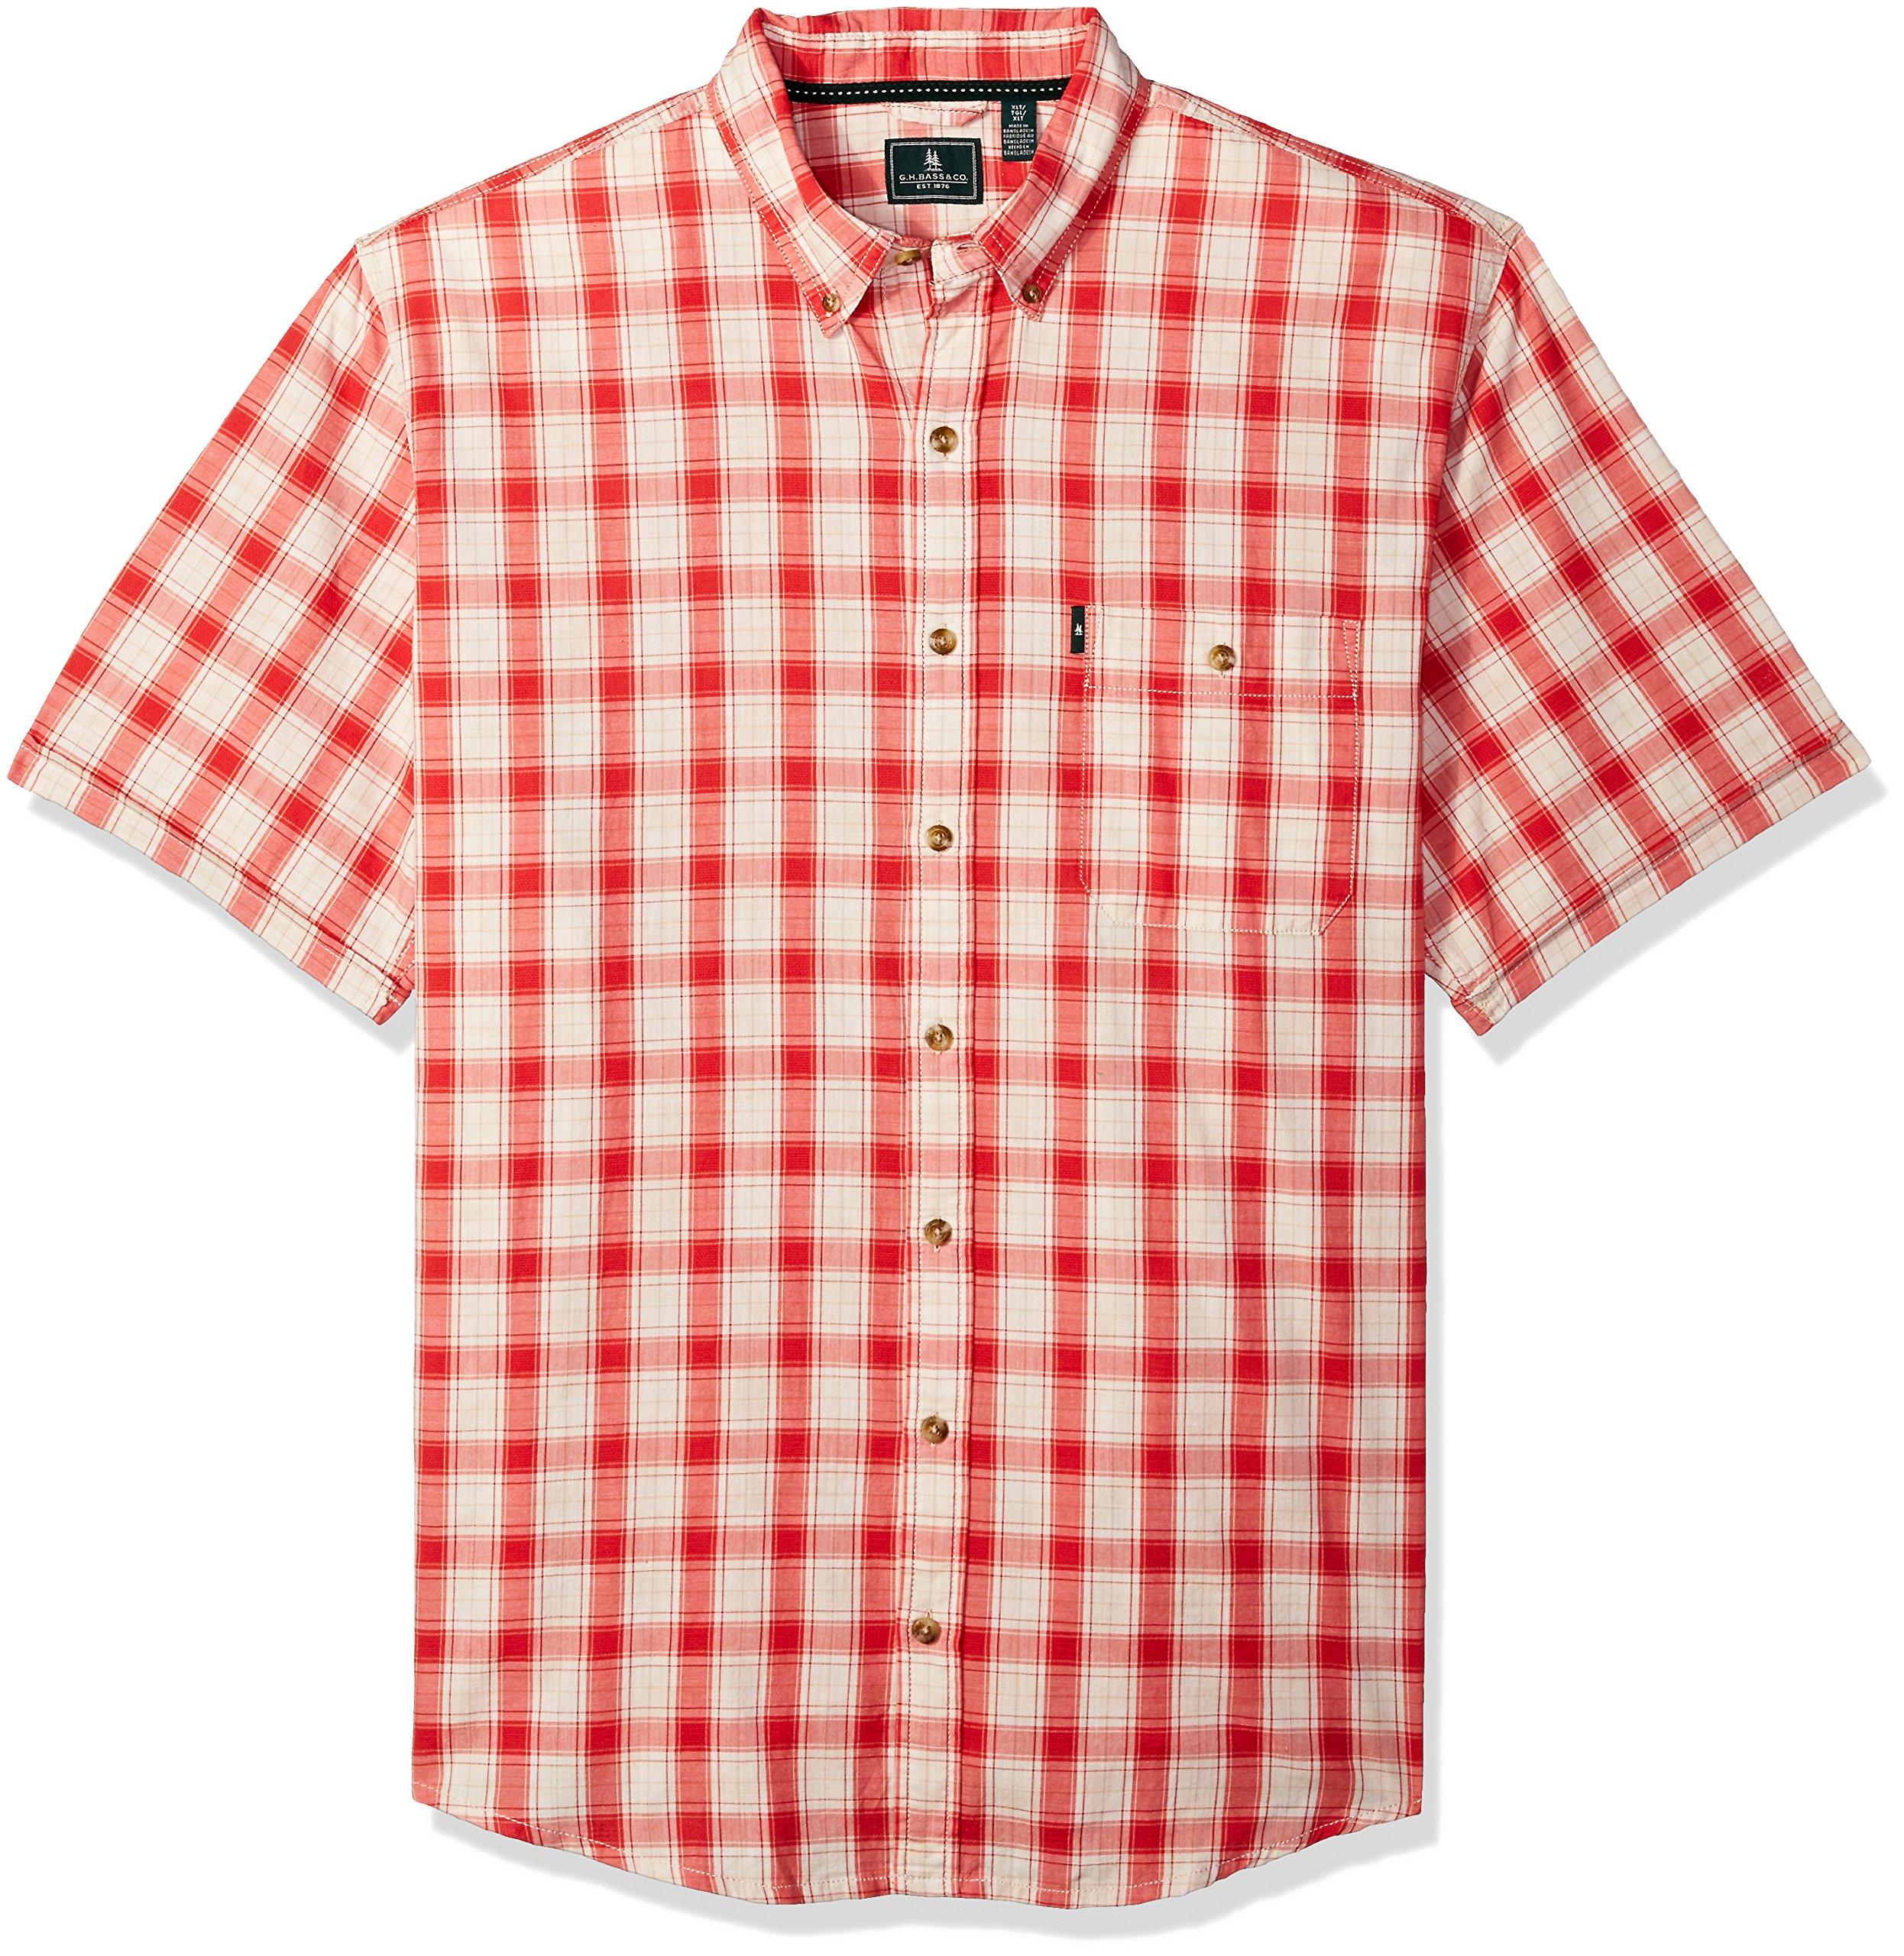 G.H. Bass & Co. Men's Big and Tall Madawaska Short Sleeve Shirt